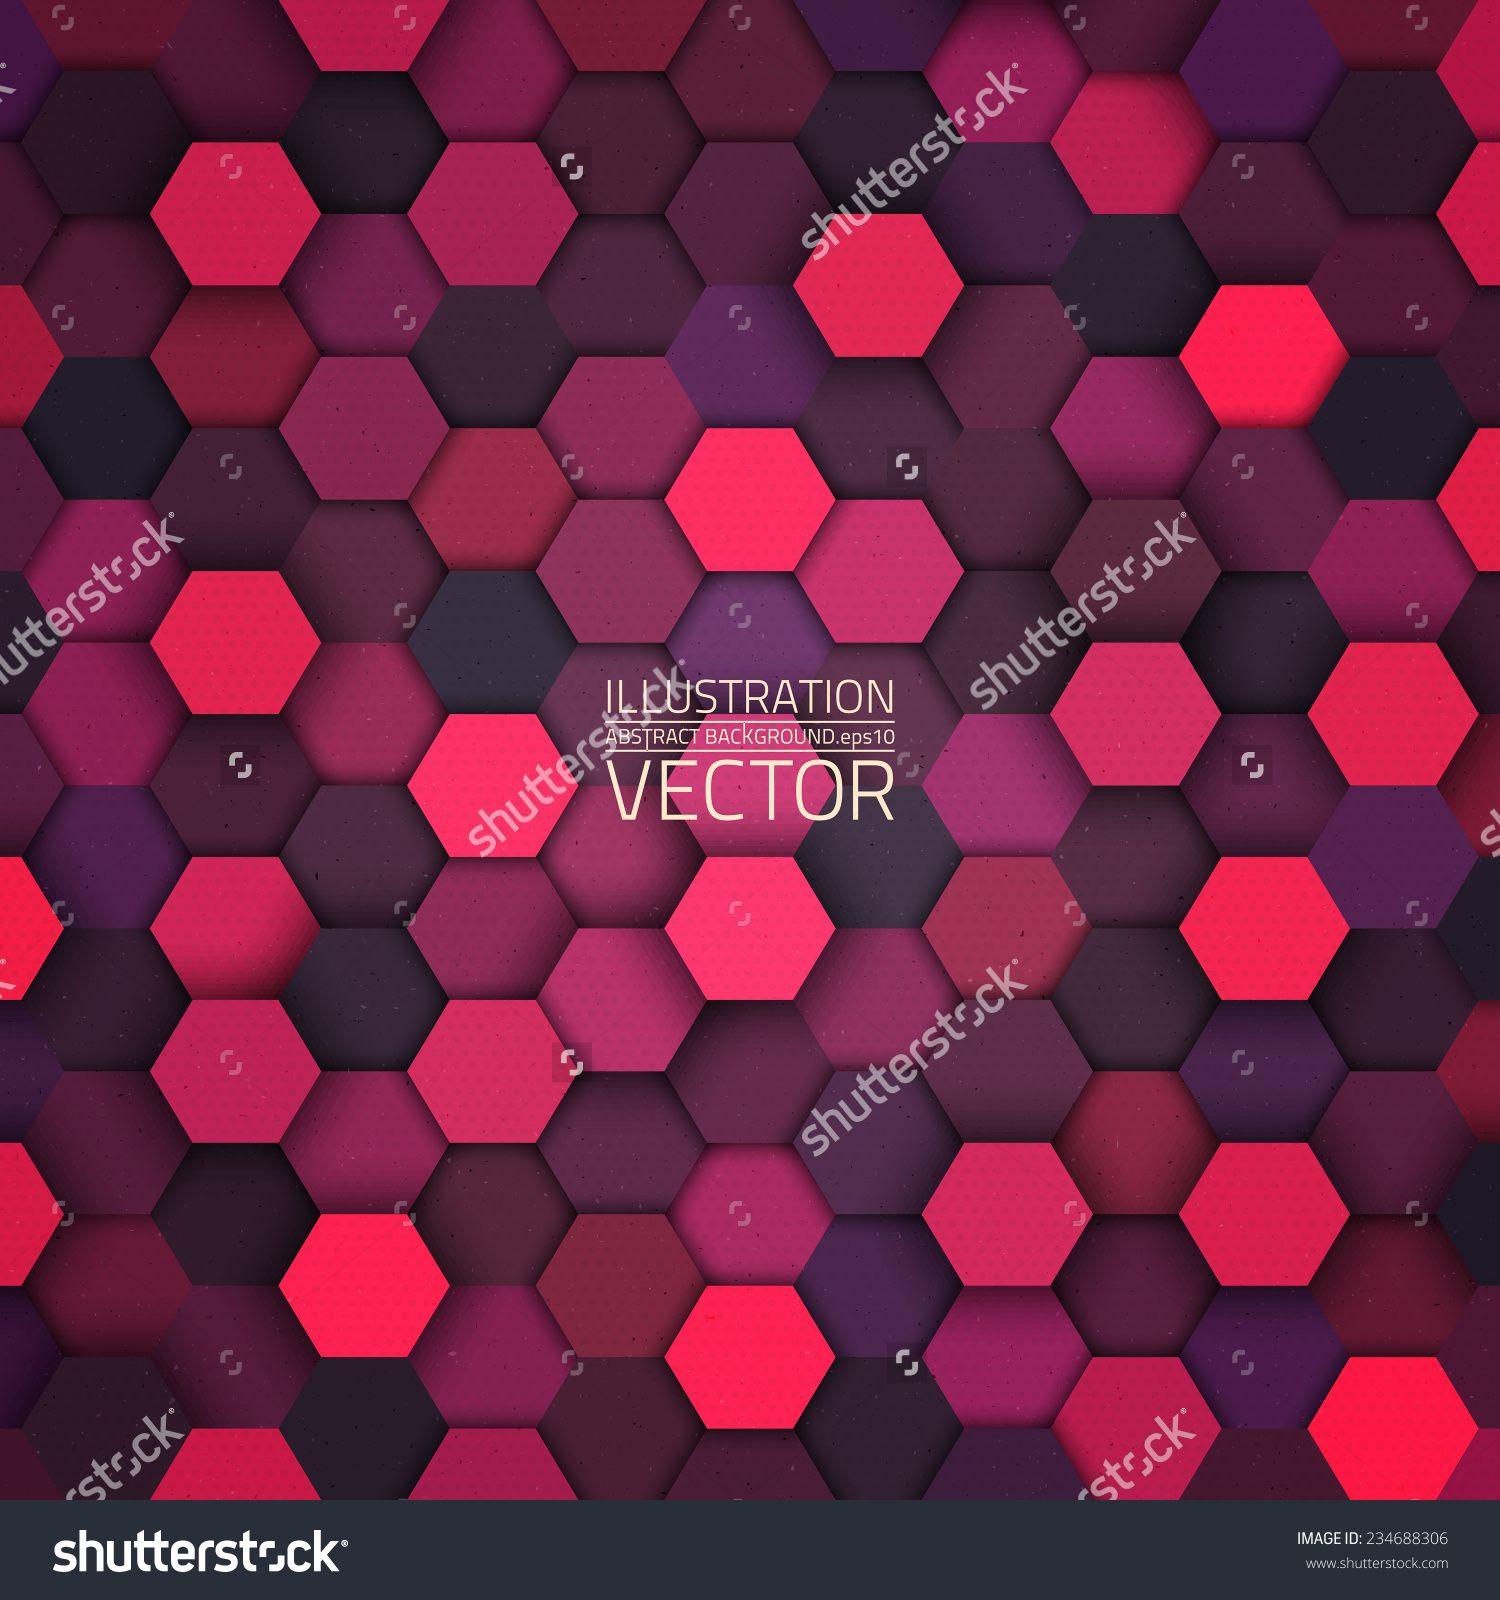 Best Wallpaper Music Bright - 3a381e716785ba4ea6e9a756a6c1efd2  Image_798663.jpg